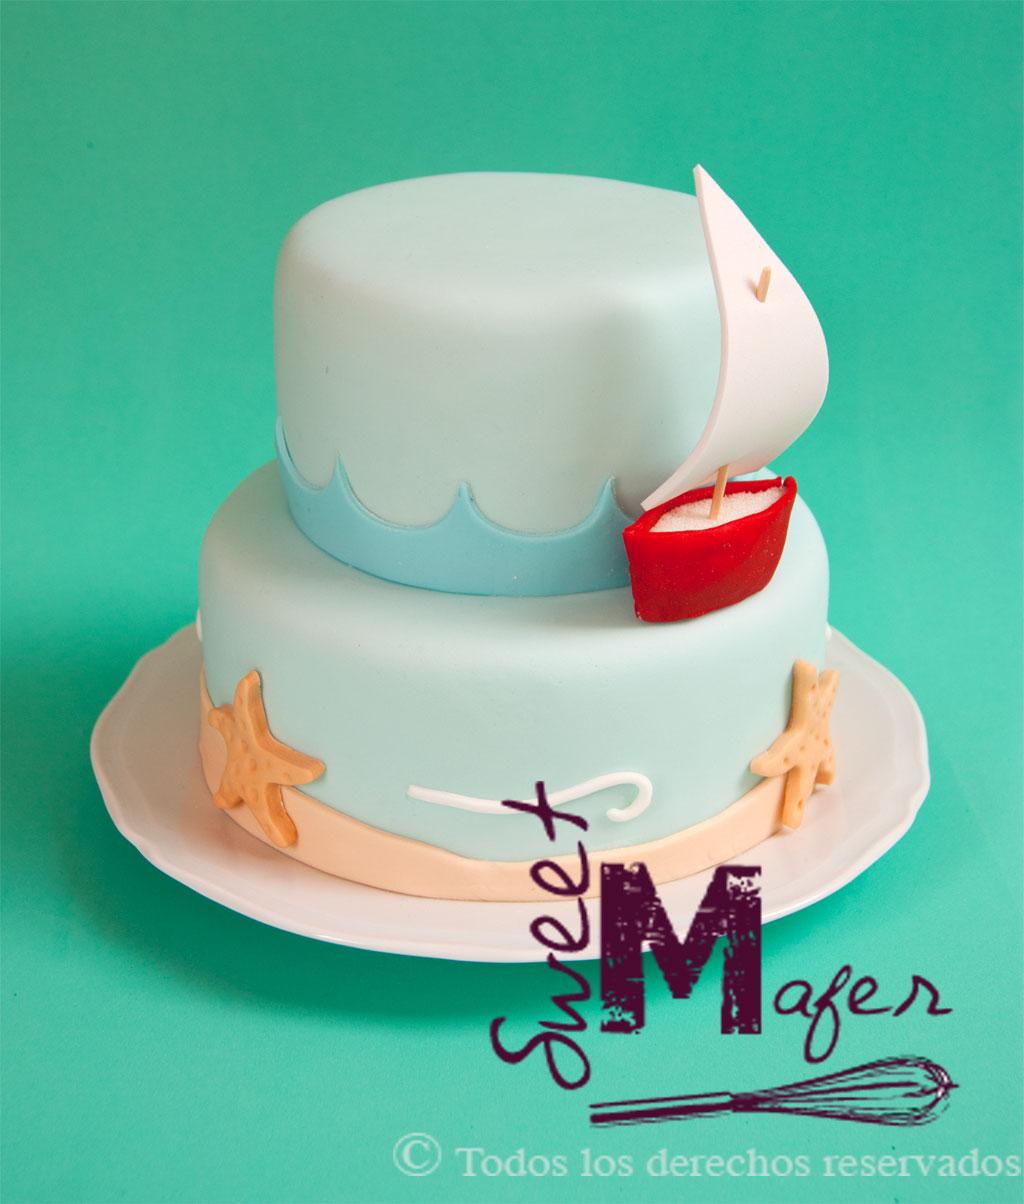 Torta con paisaje marino y barquito de sweet mafer